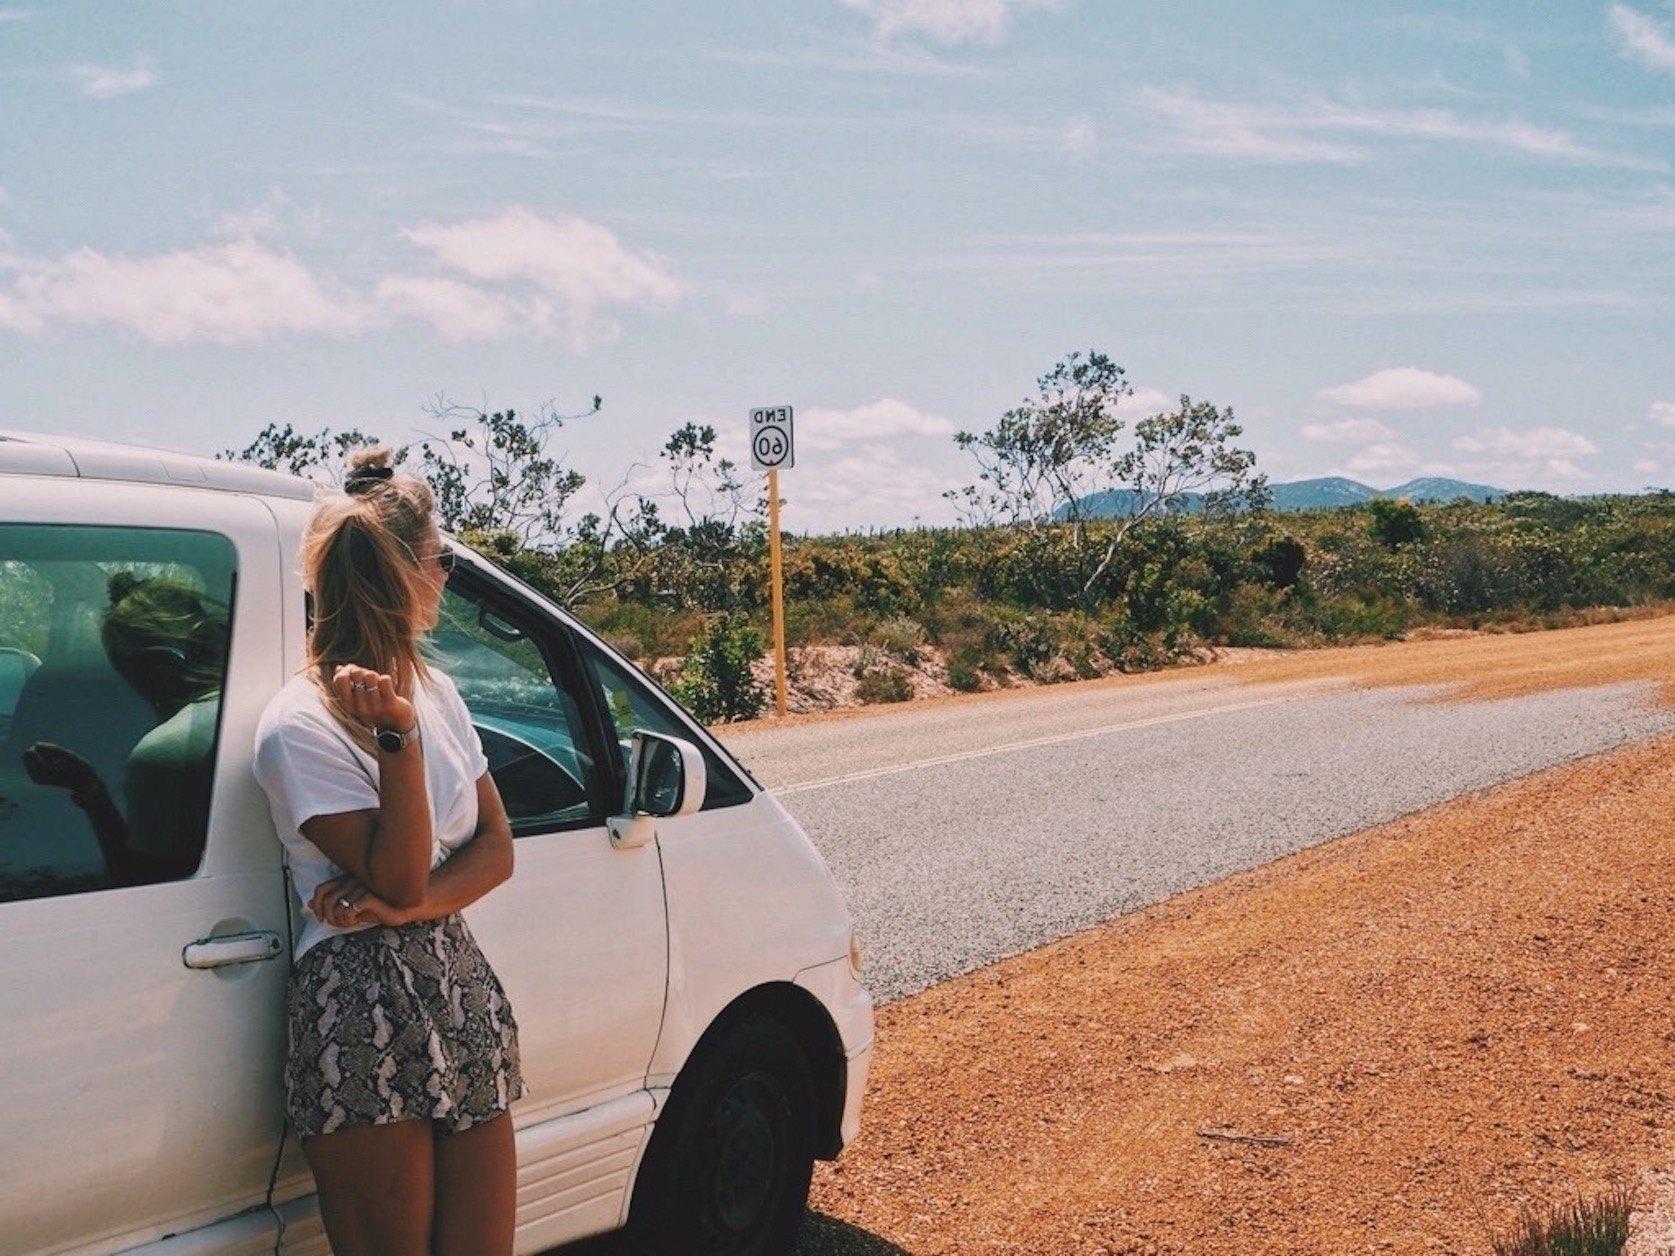 Roadtrip Fitzgerald National Park Solon Travel Lonne Rijvers Australia